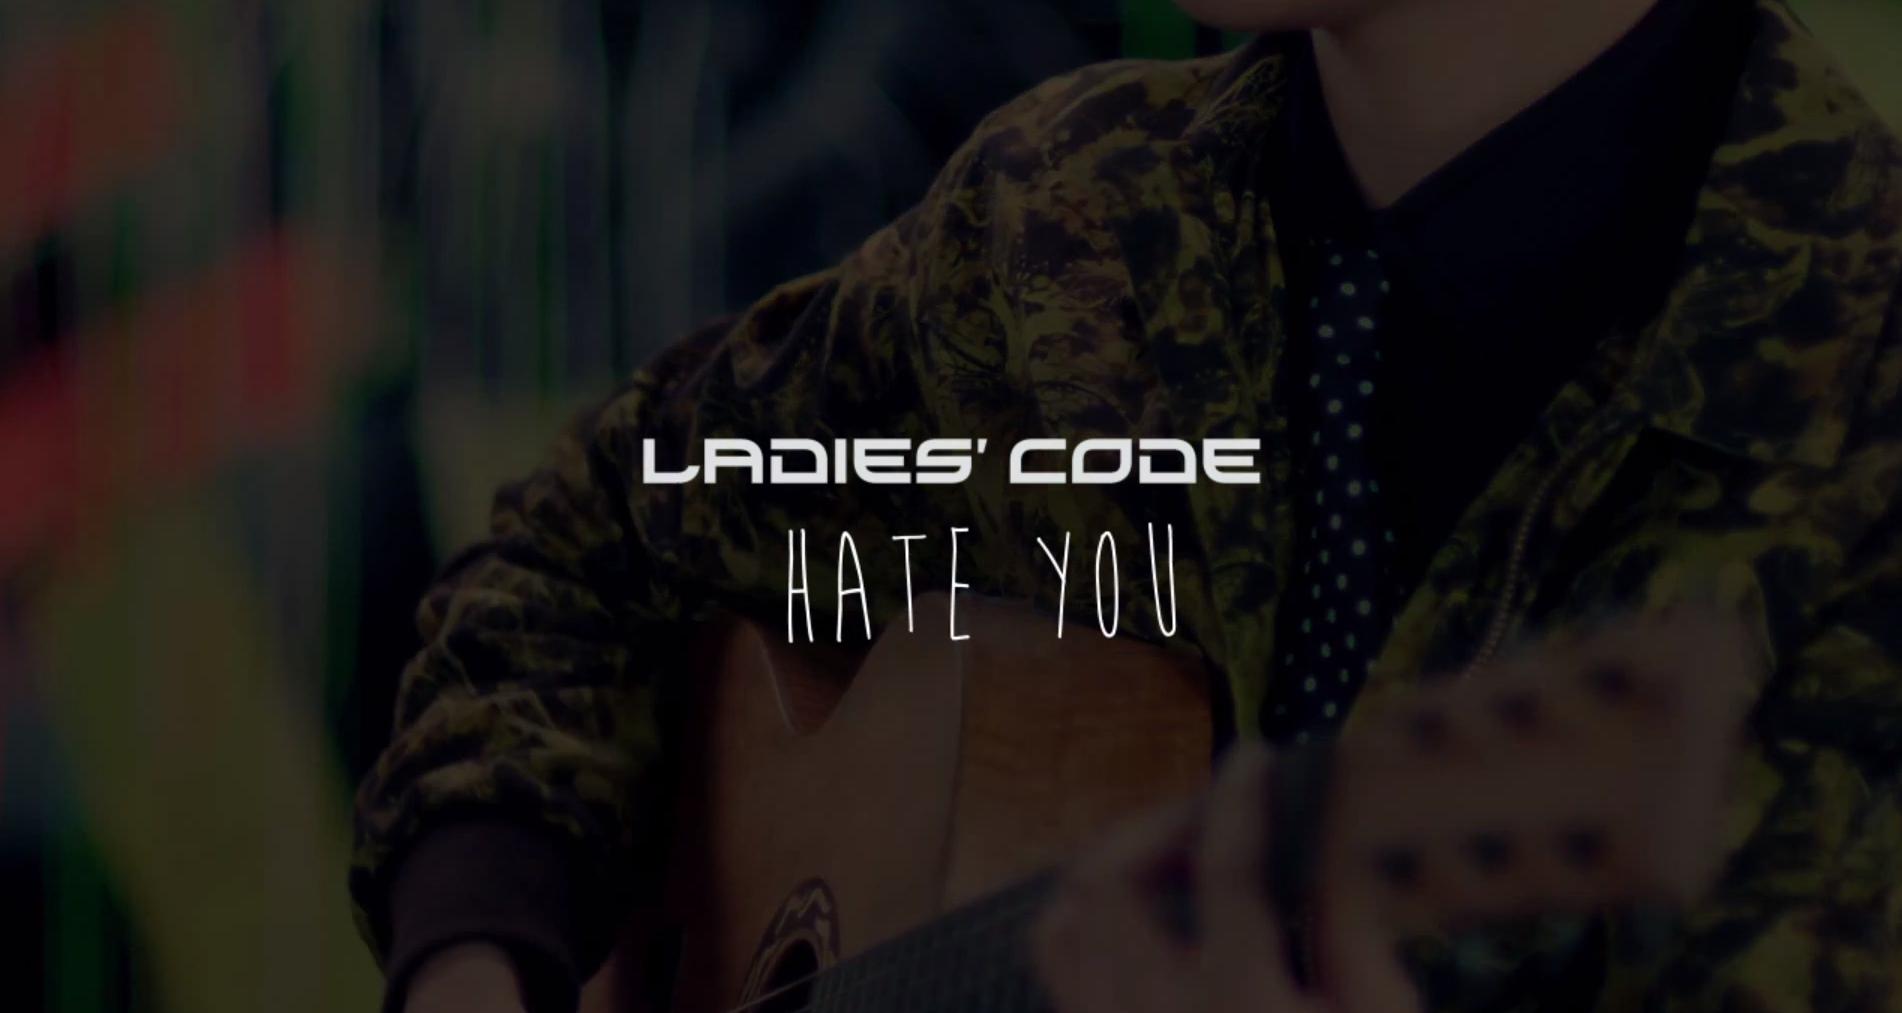 0802 ladies code